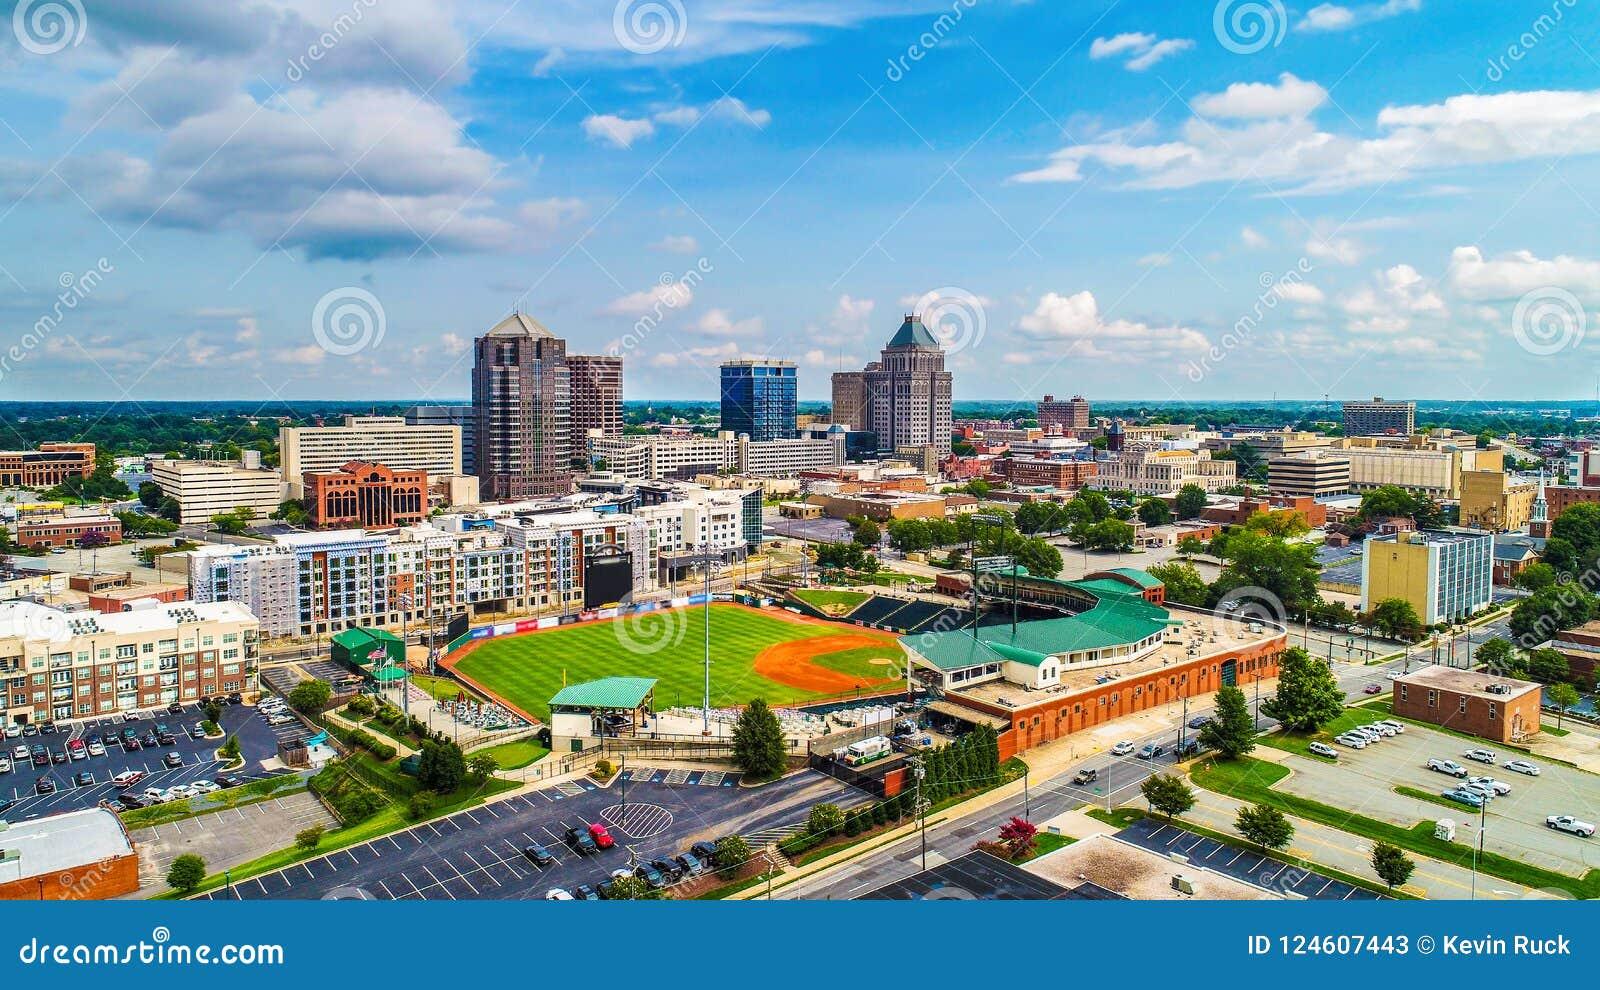 Aerial of Downtown Greensboro North Carolina NC Skyline